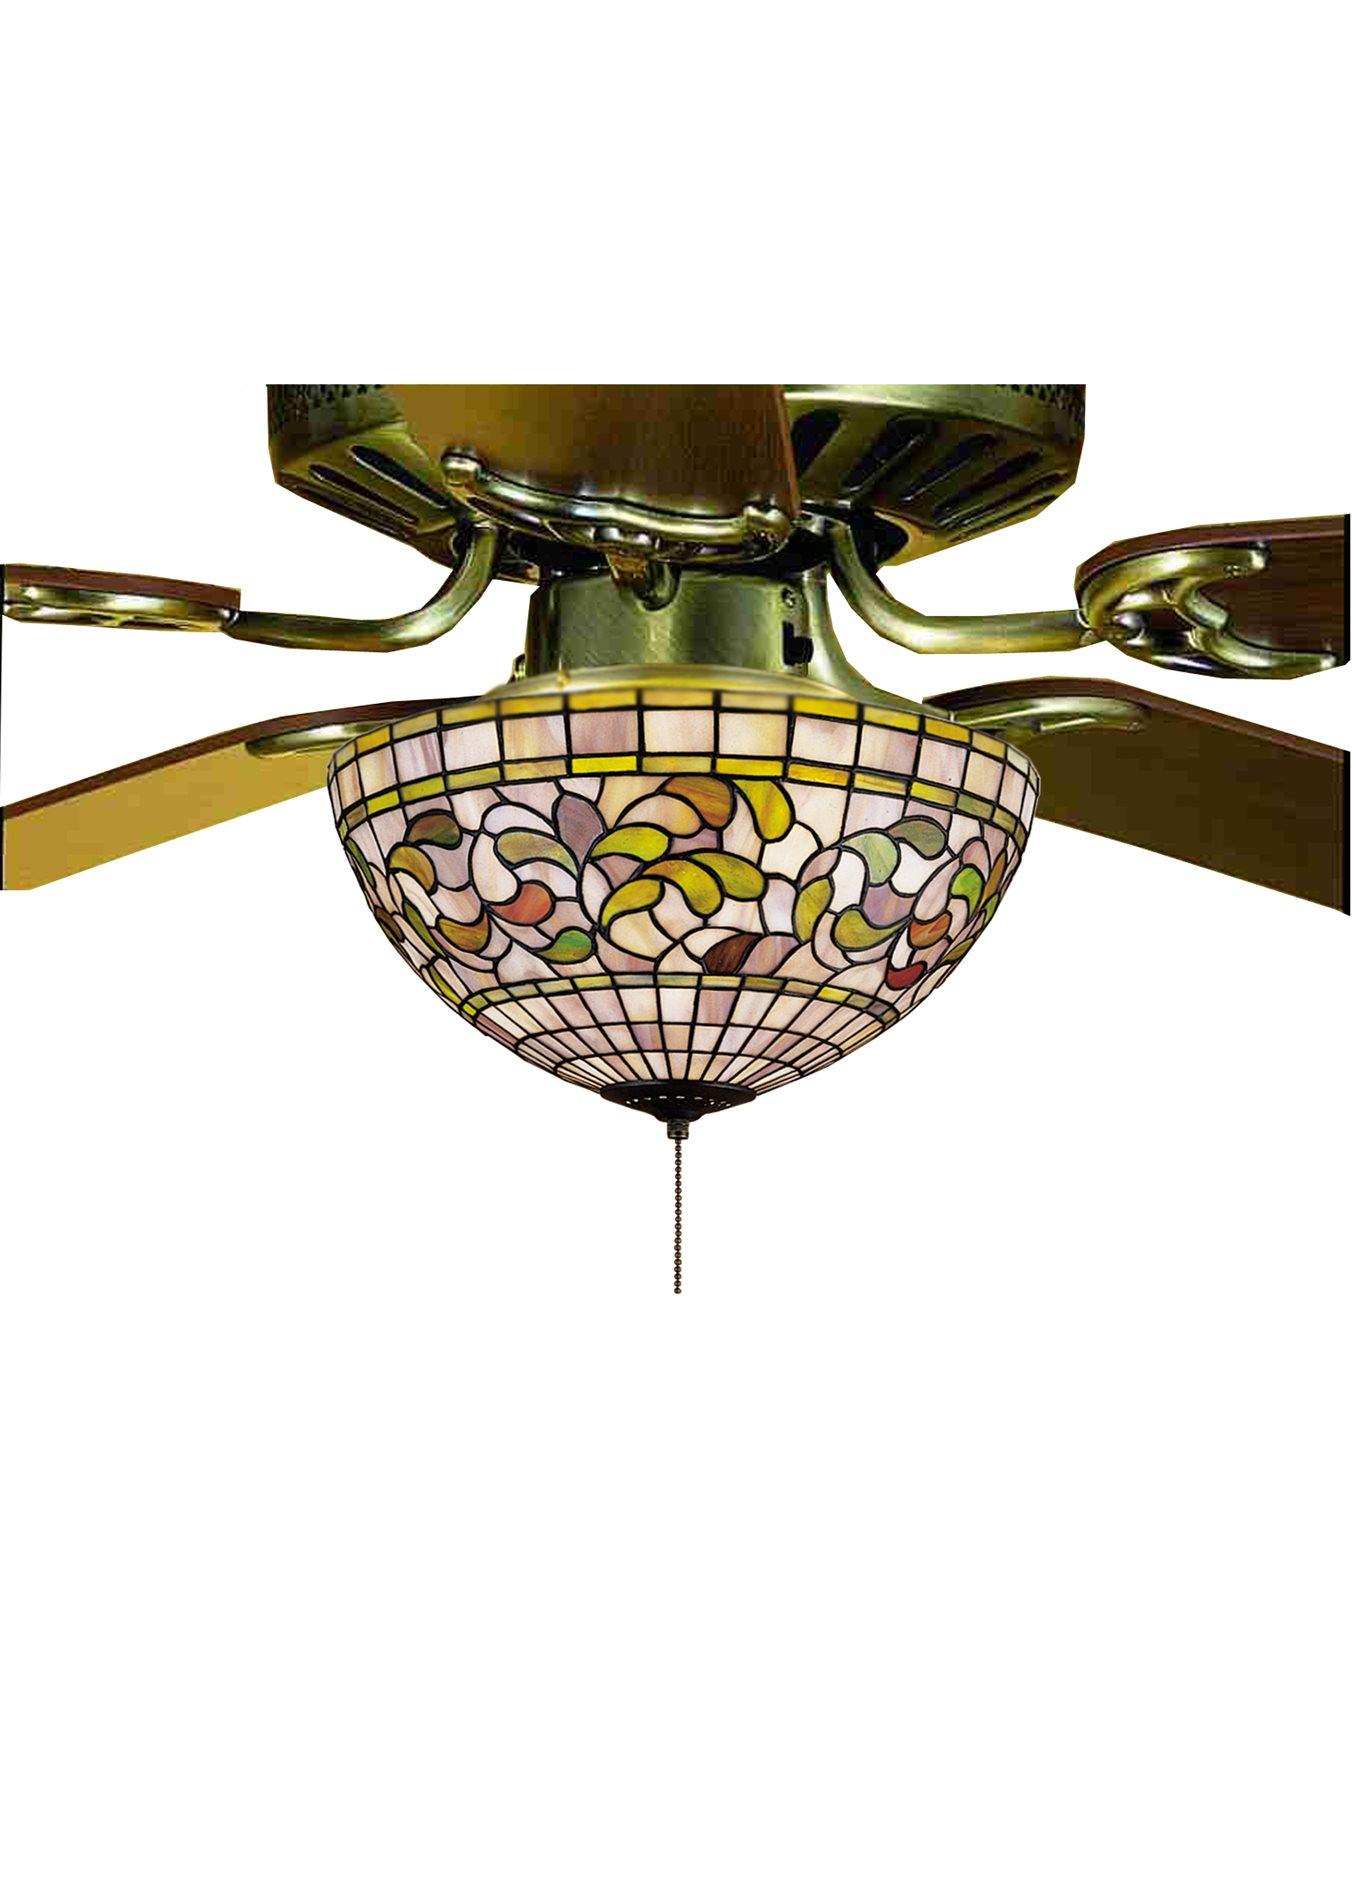 Meyda Tiffany 72650 Turning Leaf Tiffany Light Kit Md 72650